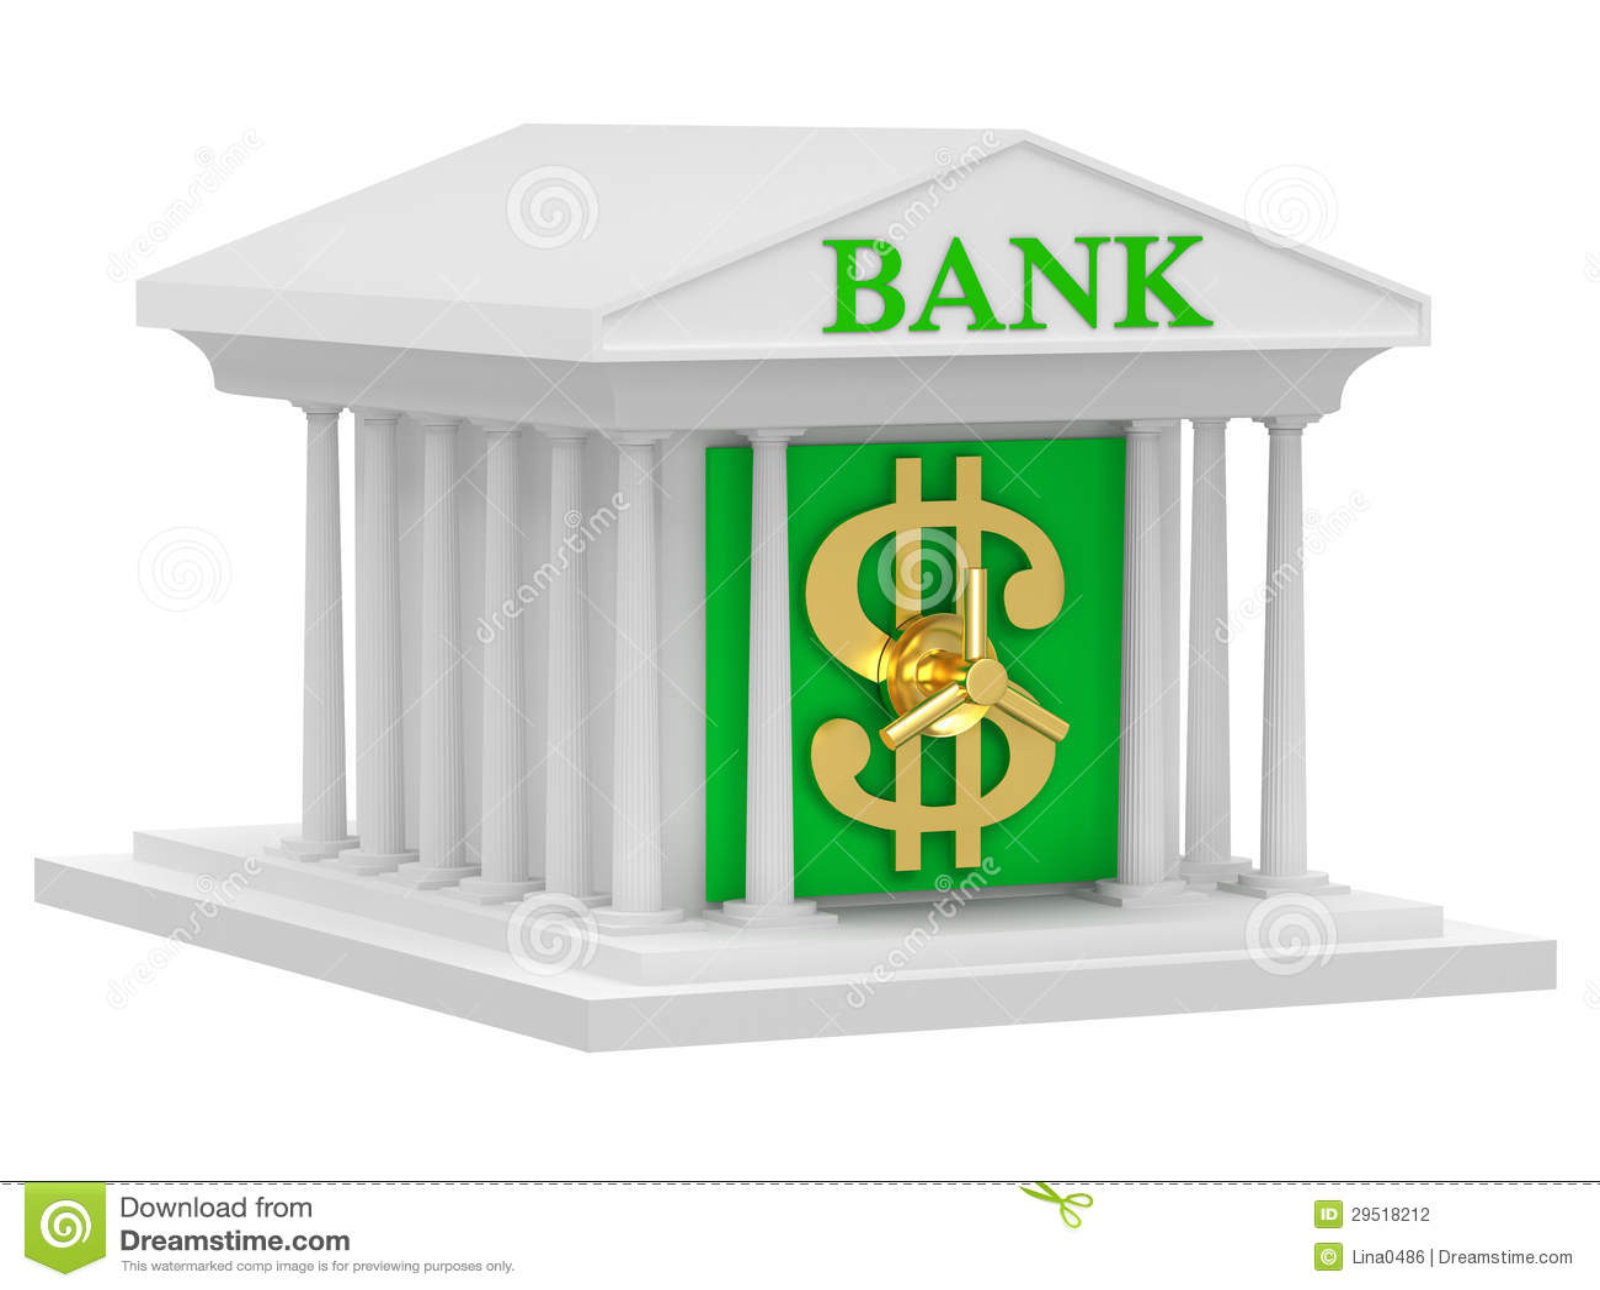 bank building clip art - photo #17